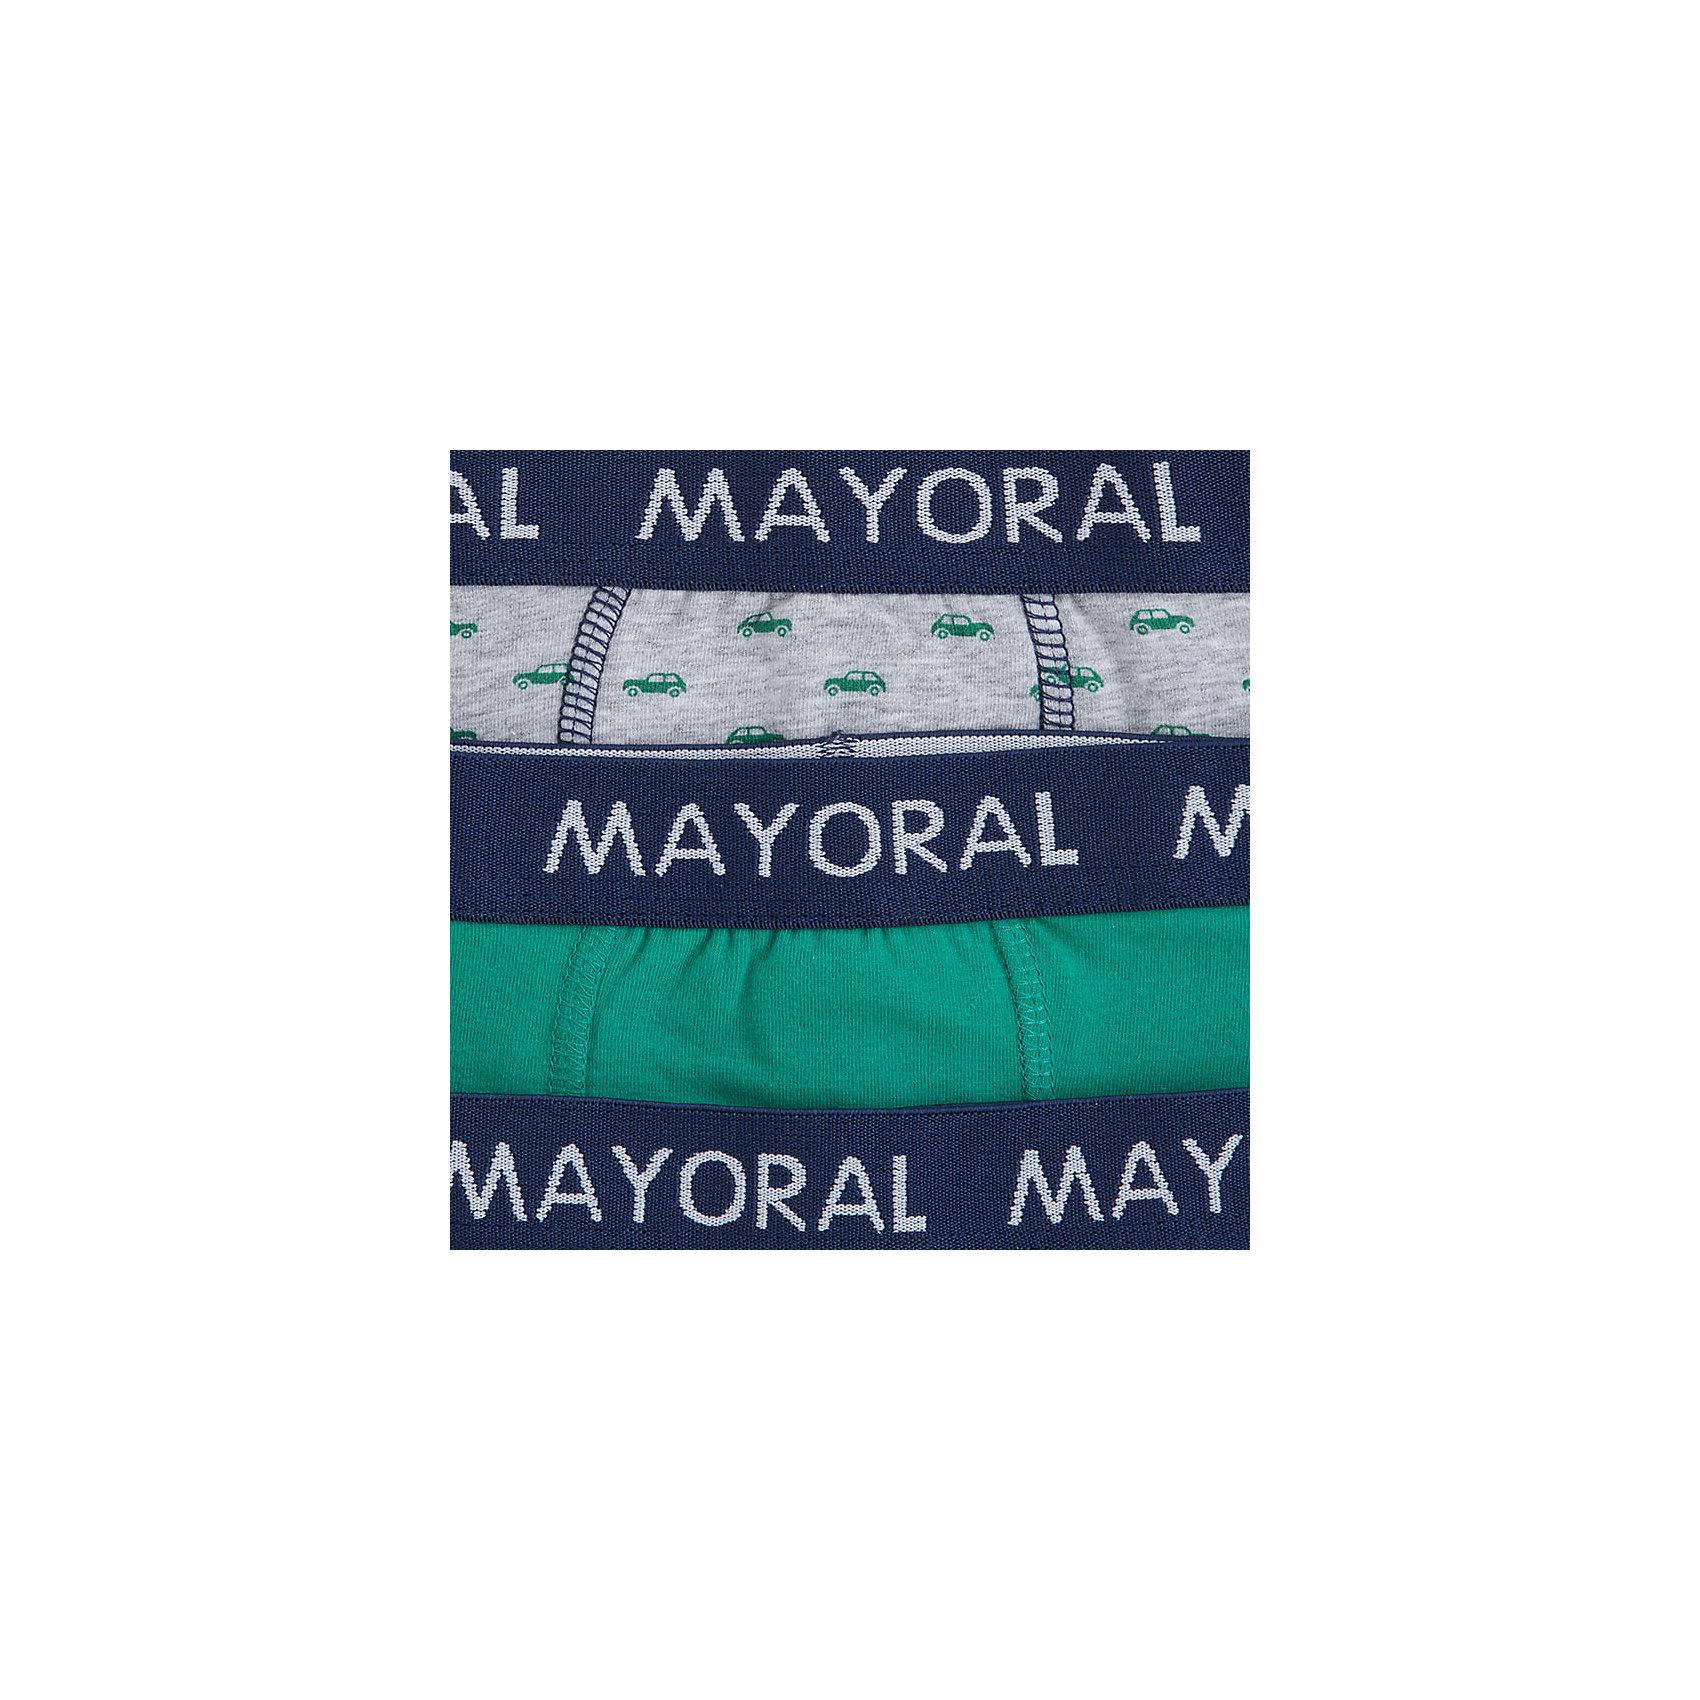 ��������: 2 ���� ������ ��� �������� Mayoral